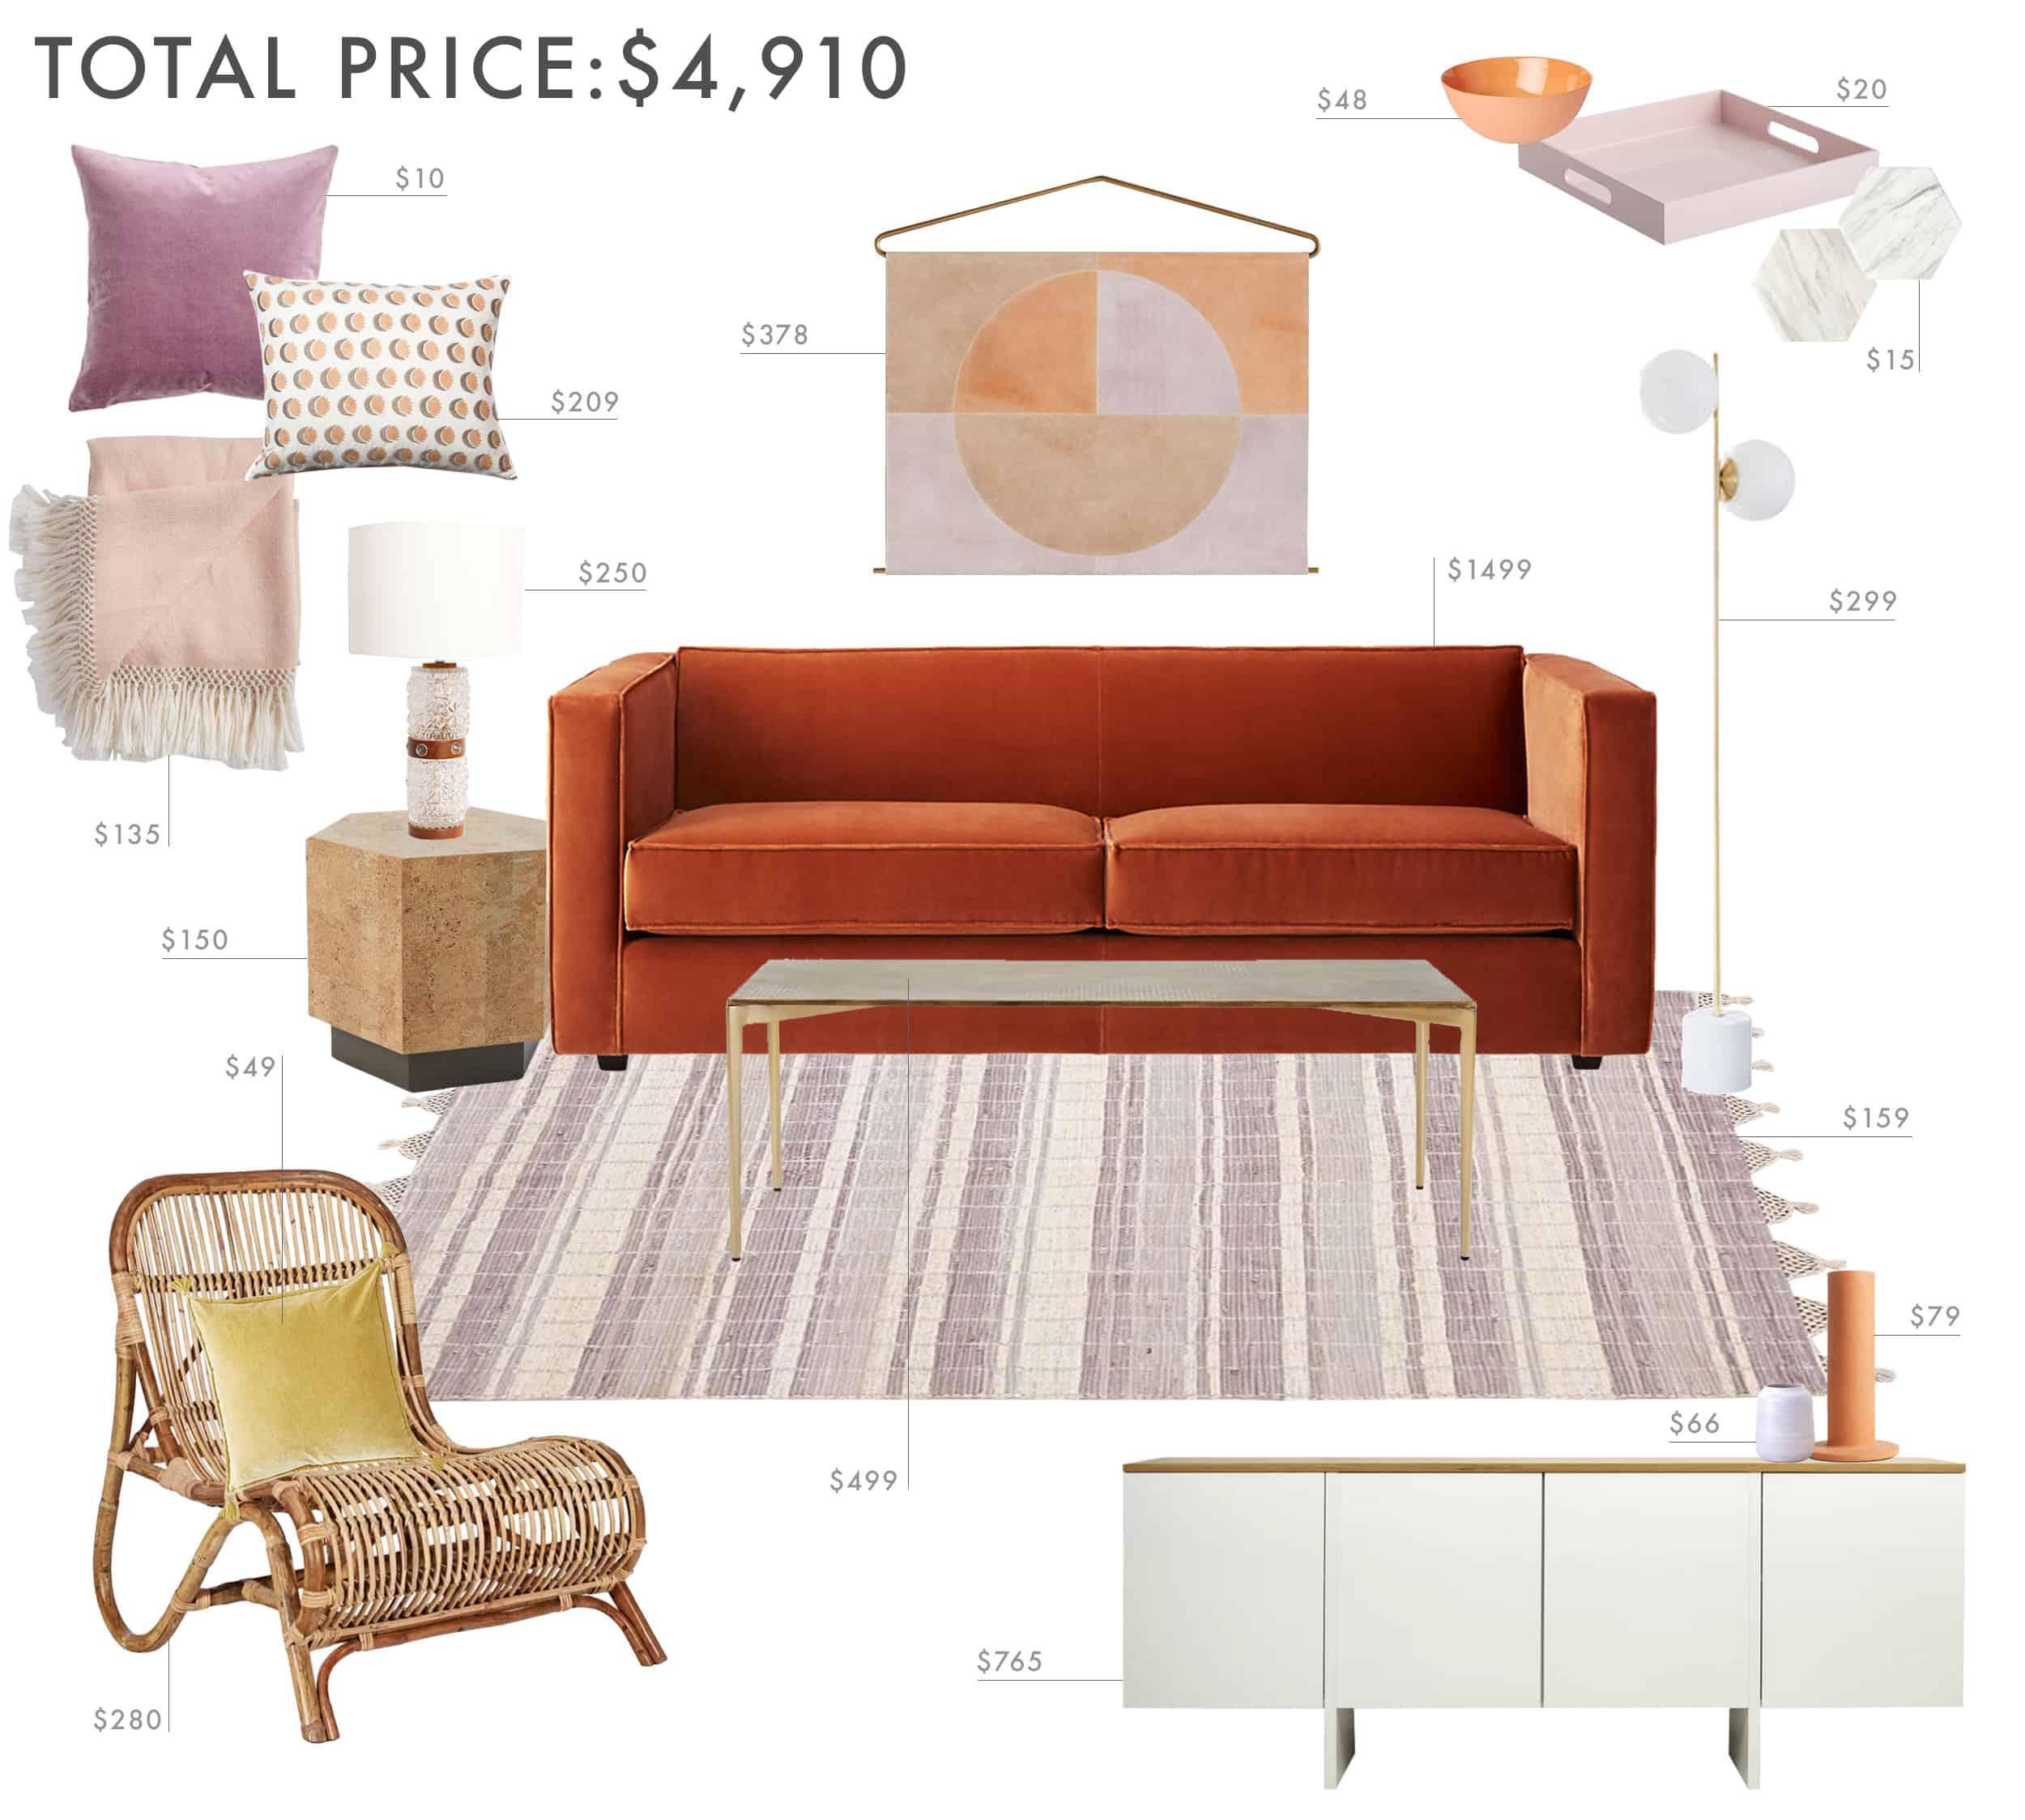 Emily Henderson Budget Room Lilac Living Room Under 5000k